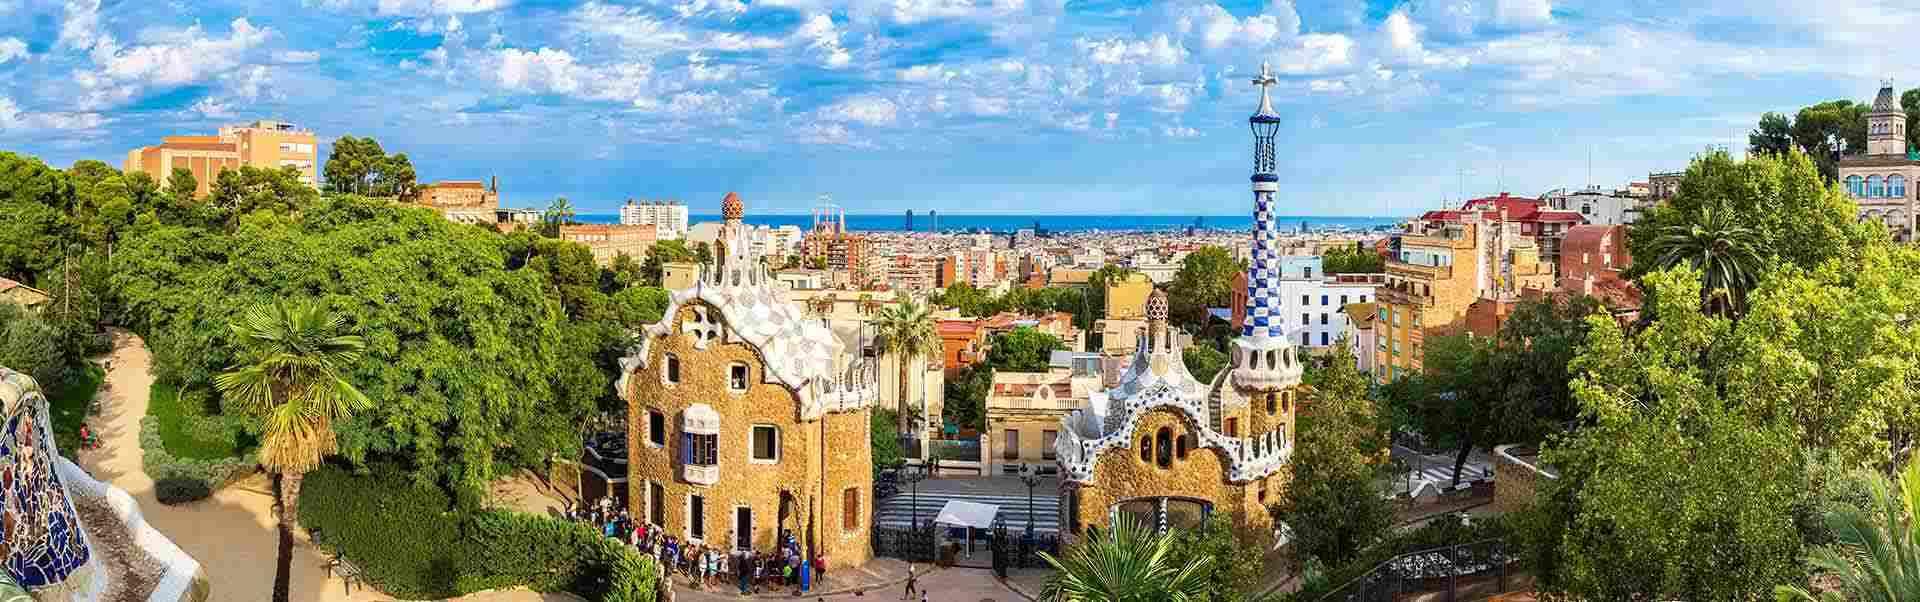 2019 Educatius High School Programs in Spain for International Students